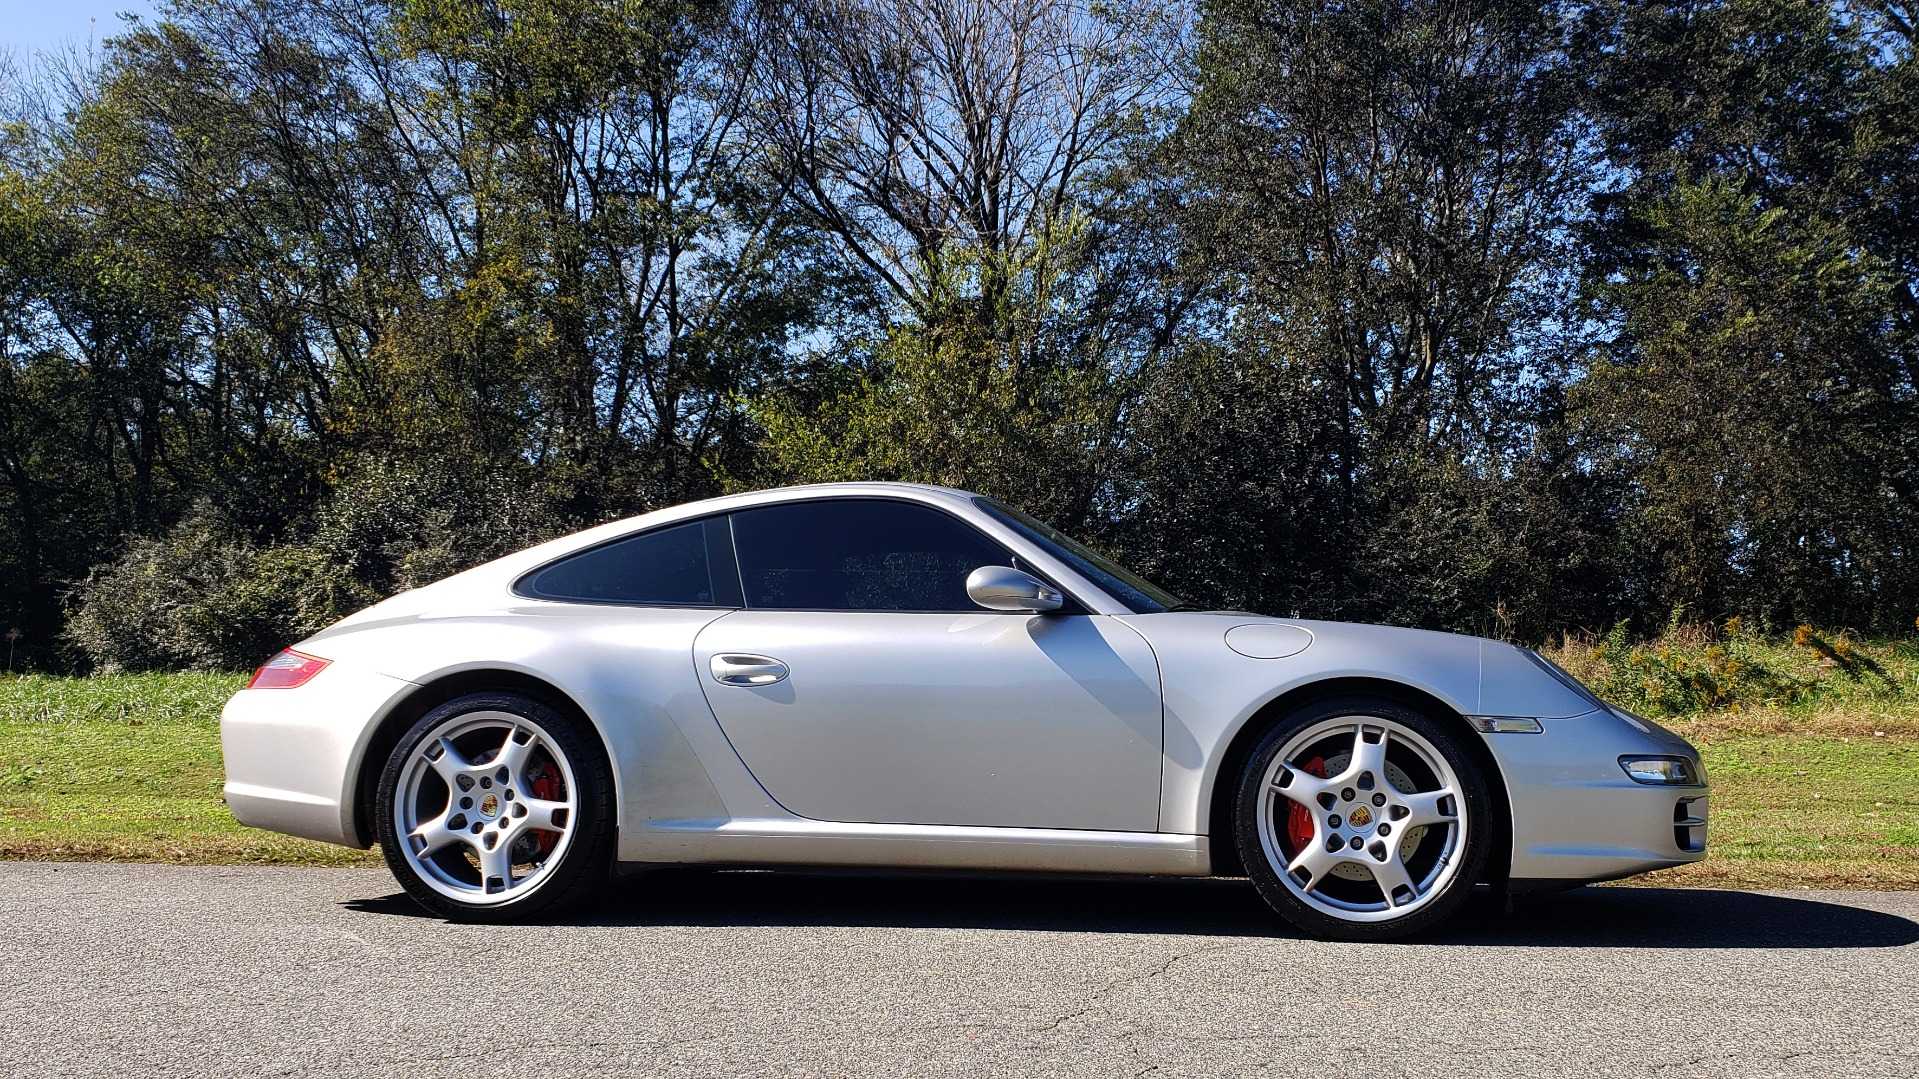 Used 2006 Porsche 911 CARRERA S / 5-SPD AUTO / SPORT CHRONO / NAV / BOSE / SUNROOF for sale Sold at Formula Imports in Charlotte NC 28227 9